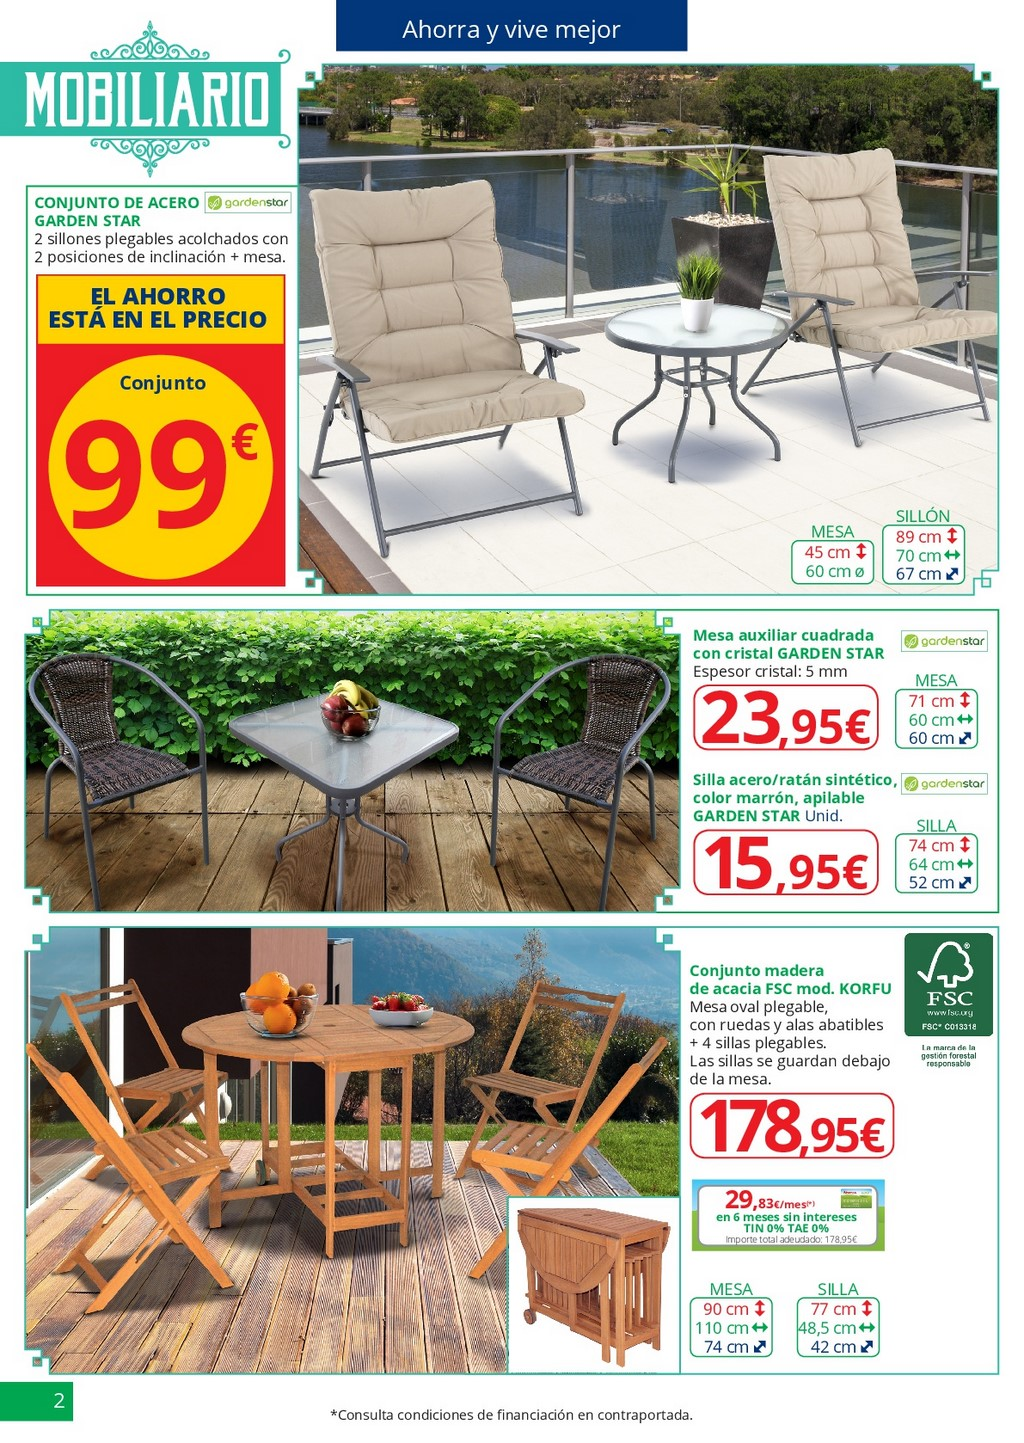 Especial jardin2 for Jardin alcampo 2016